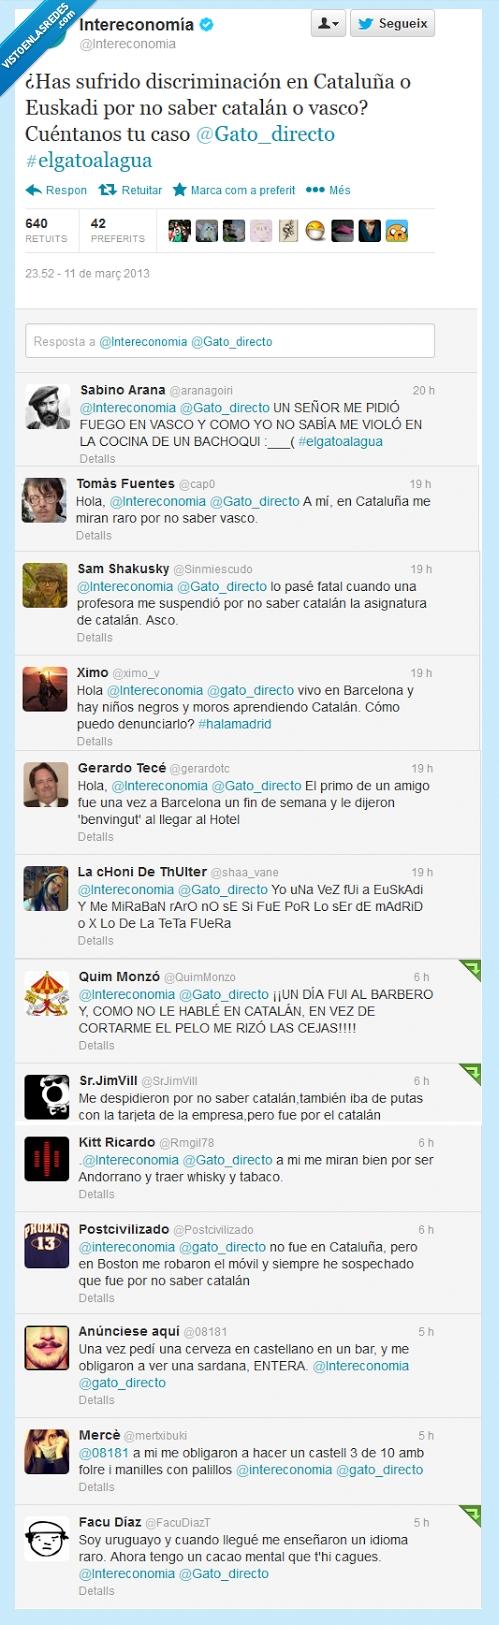 Intereconomía pregunta: '¿Has sufrido discriminación en Cataluña o Euskadi por no saber catalán o vasco?'. Reacciones